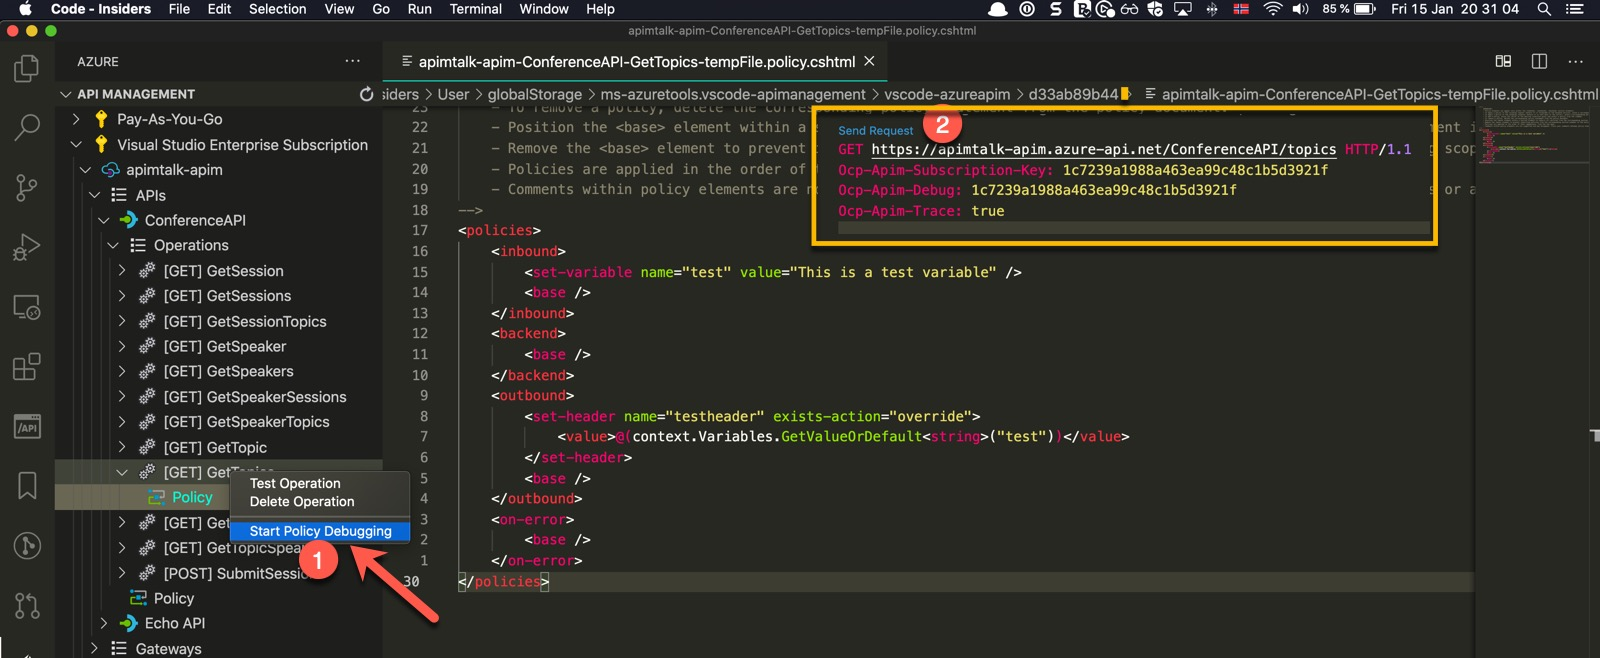 Start Debugging Policy in Azure API Management